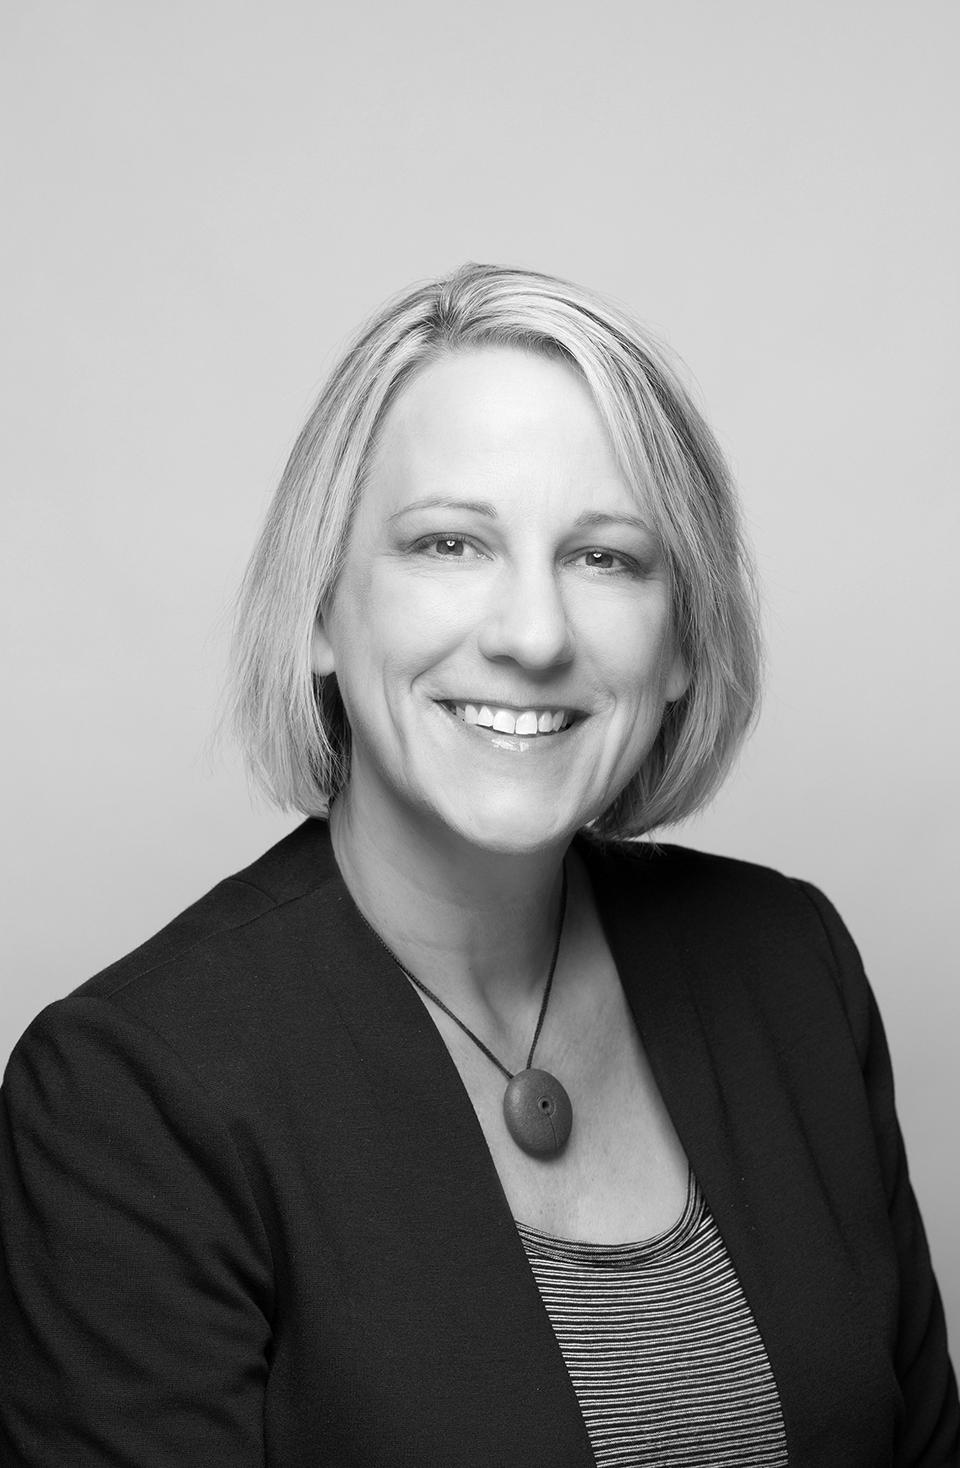 Photo of Karen Hofmann who won the IDSA Education Award.